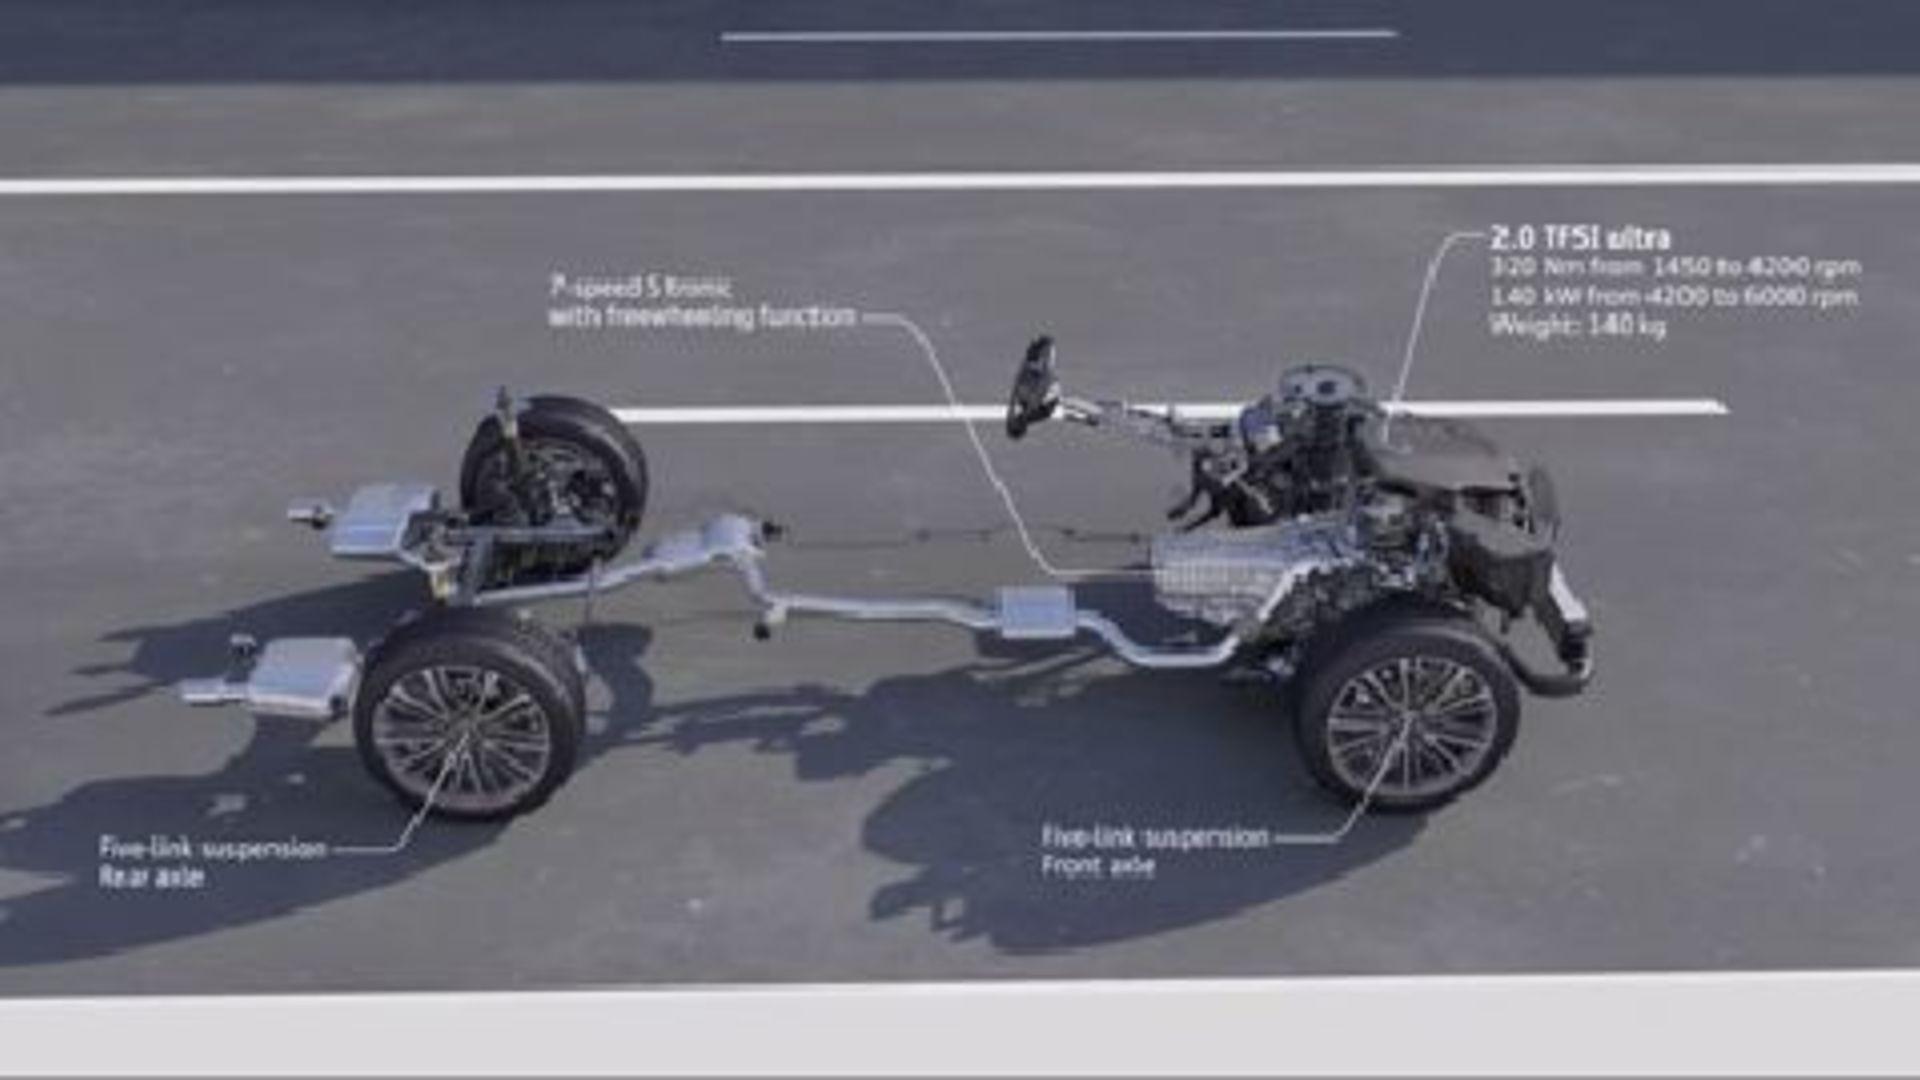 Audi A4 2.0 TFSI ultra (2015) - Animation